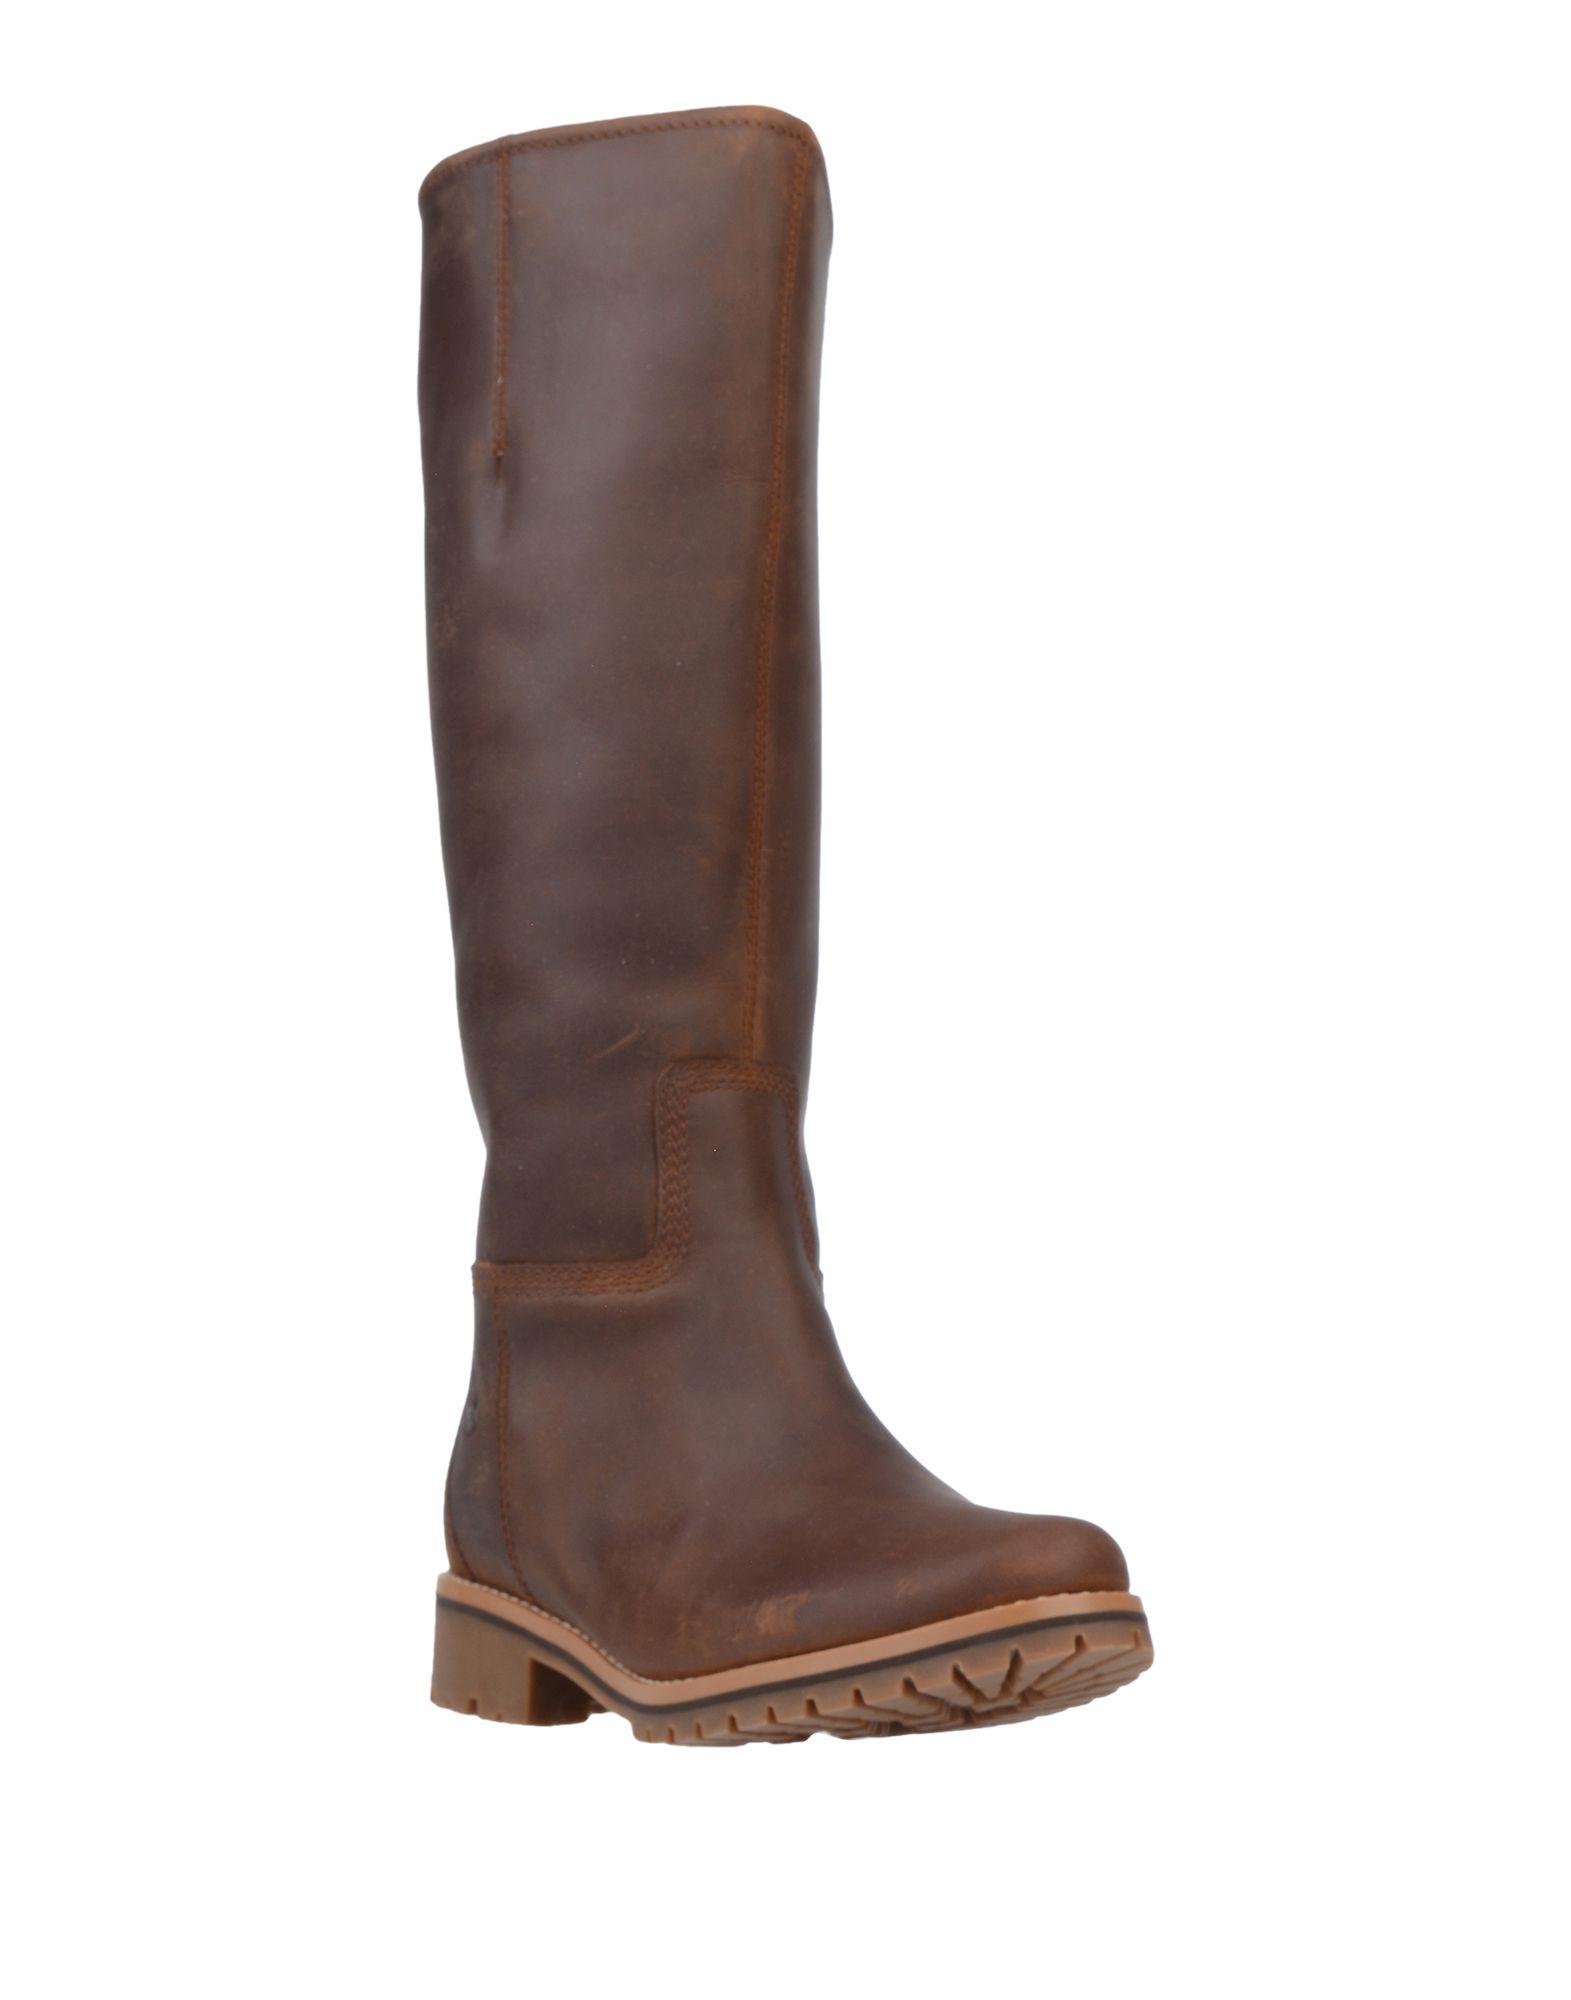 Timberland - Footwear - Boots - On Yoox.com